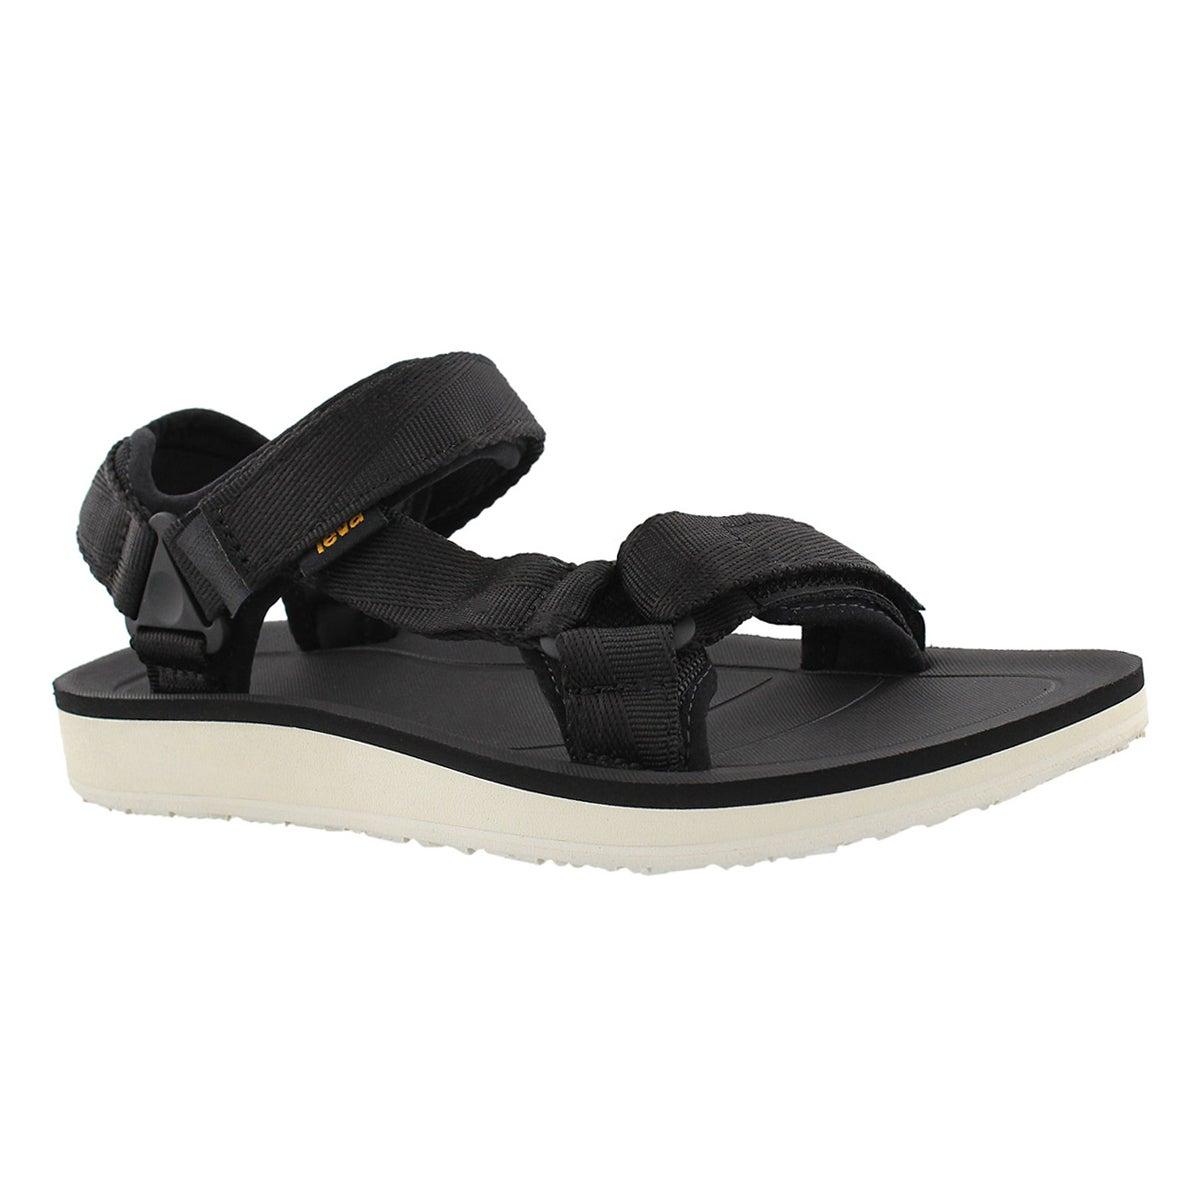 Women's ORIGINAL UNIVERSAL PREMIER blk sandals